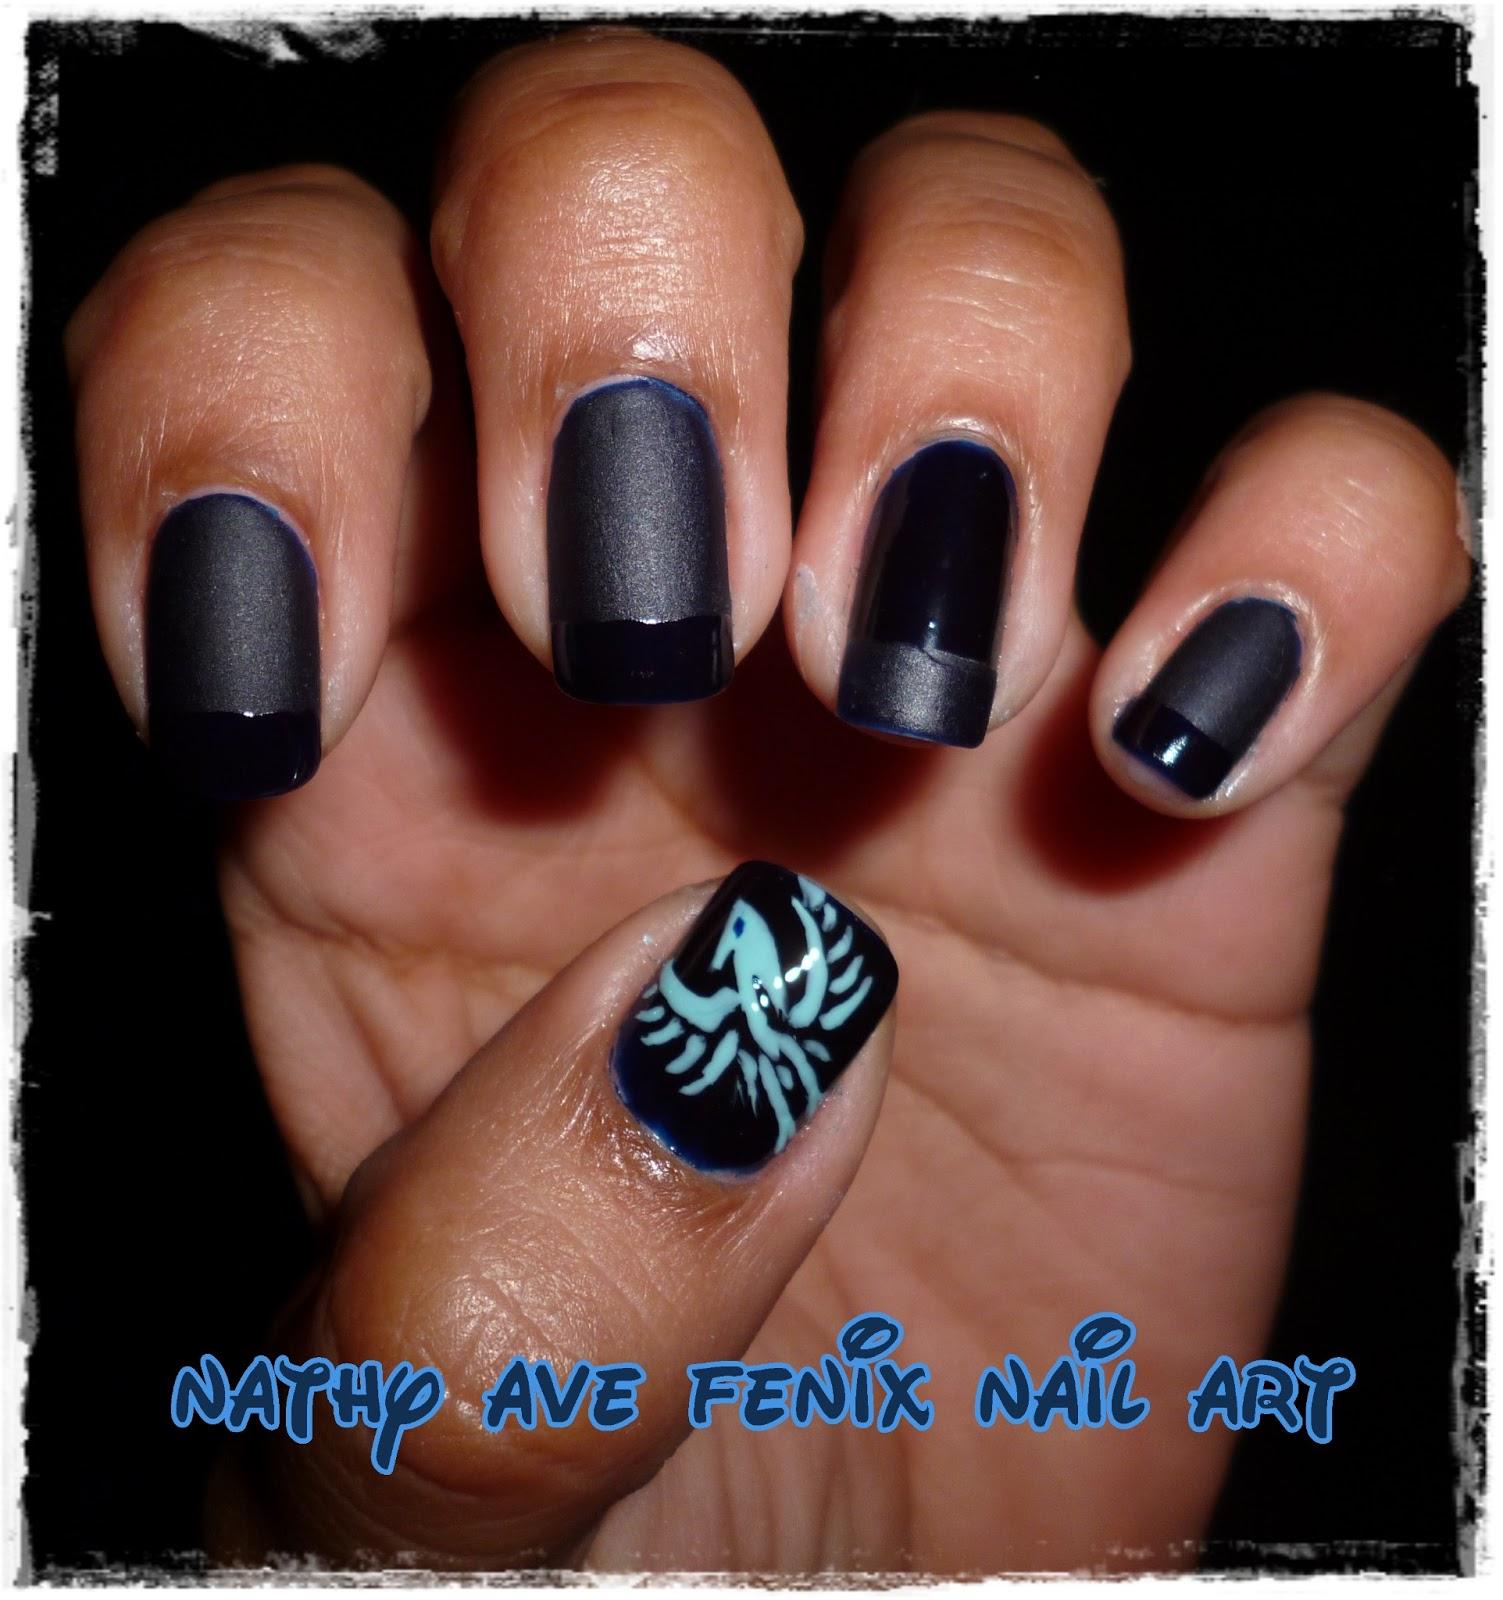 Nail Art Pik Avenue: NATHY AVE FENIX NAIL ART: DÍA 20 DEL RETO: VUESTRO BLOG